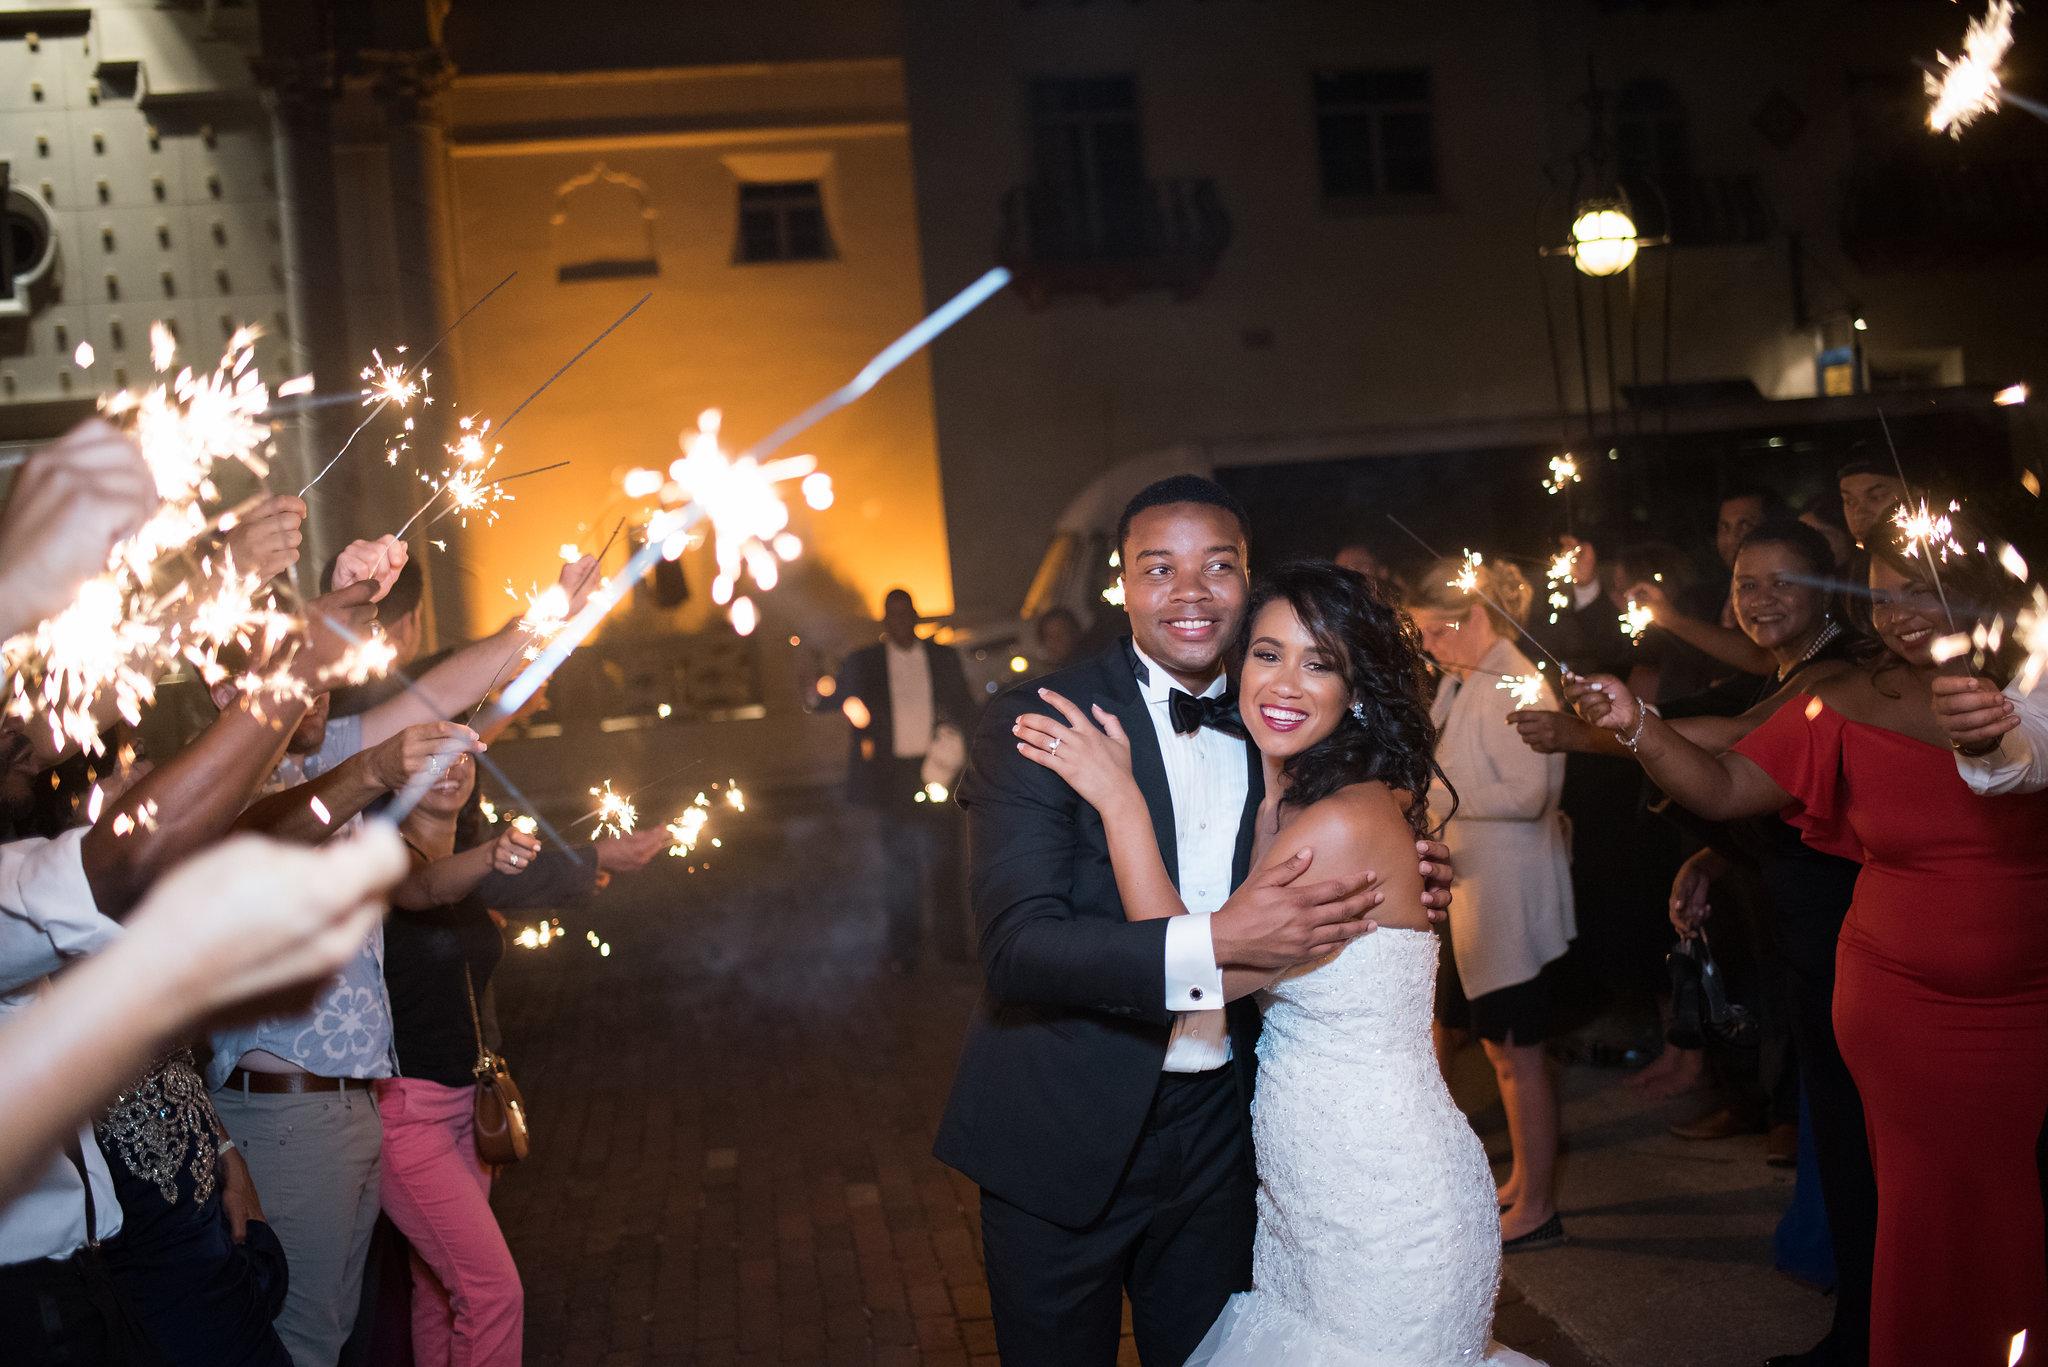 st-augustine-wedding-photographer-sarah-annay-photography.jpg9.jpg